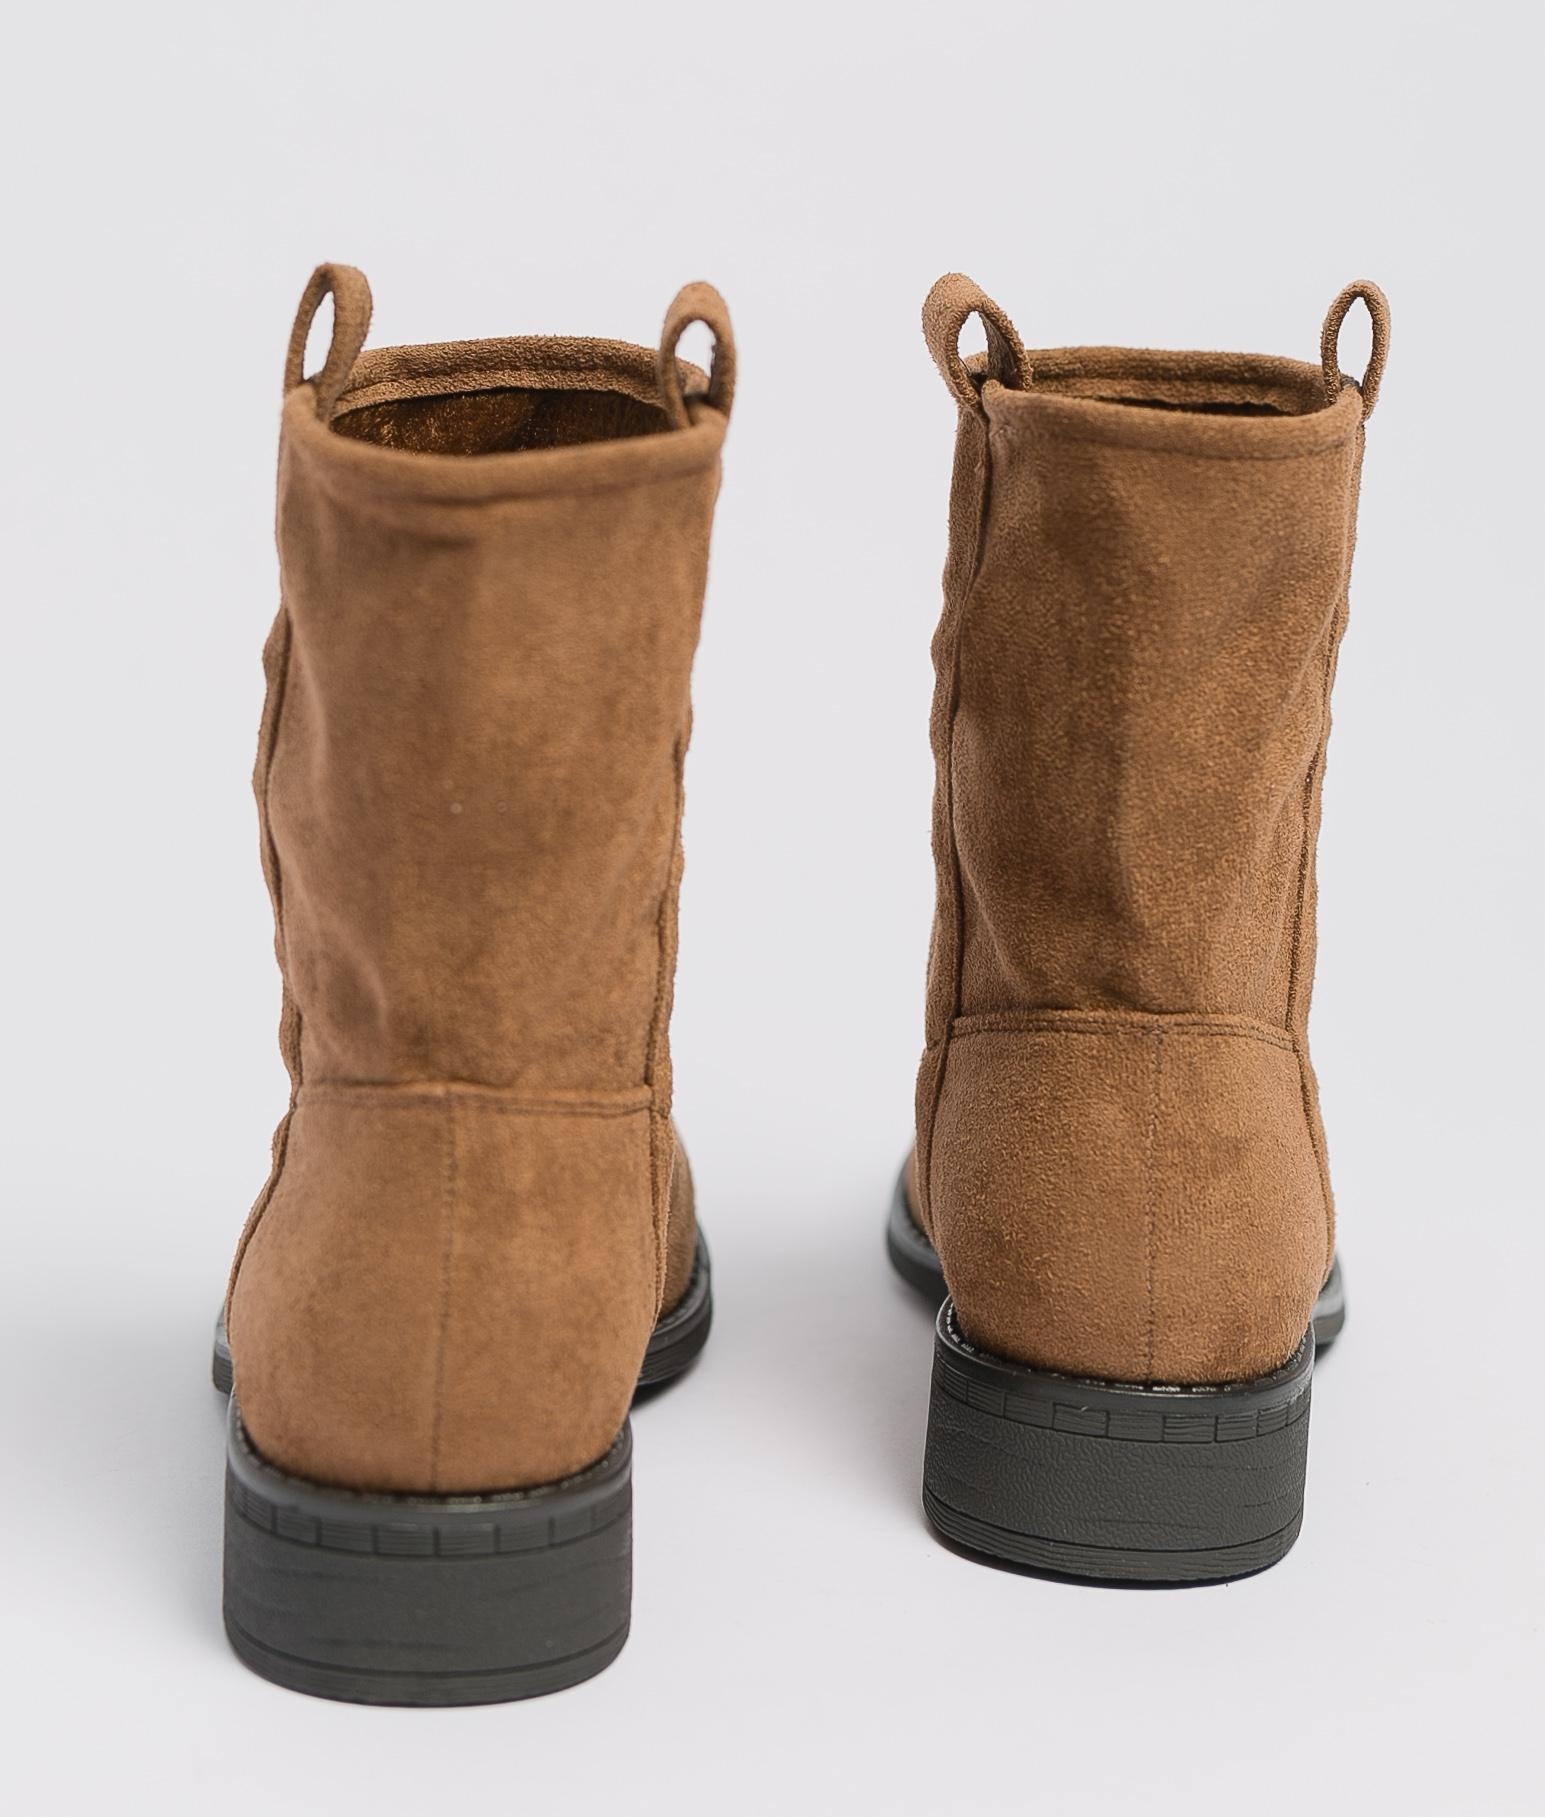 Mirea Low Boot - Camel